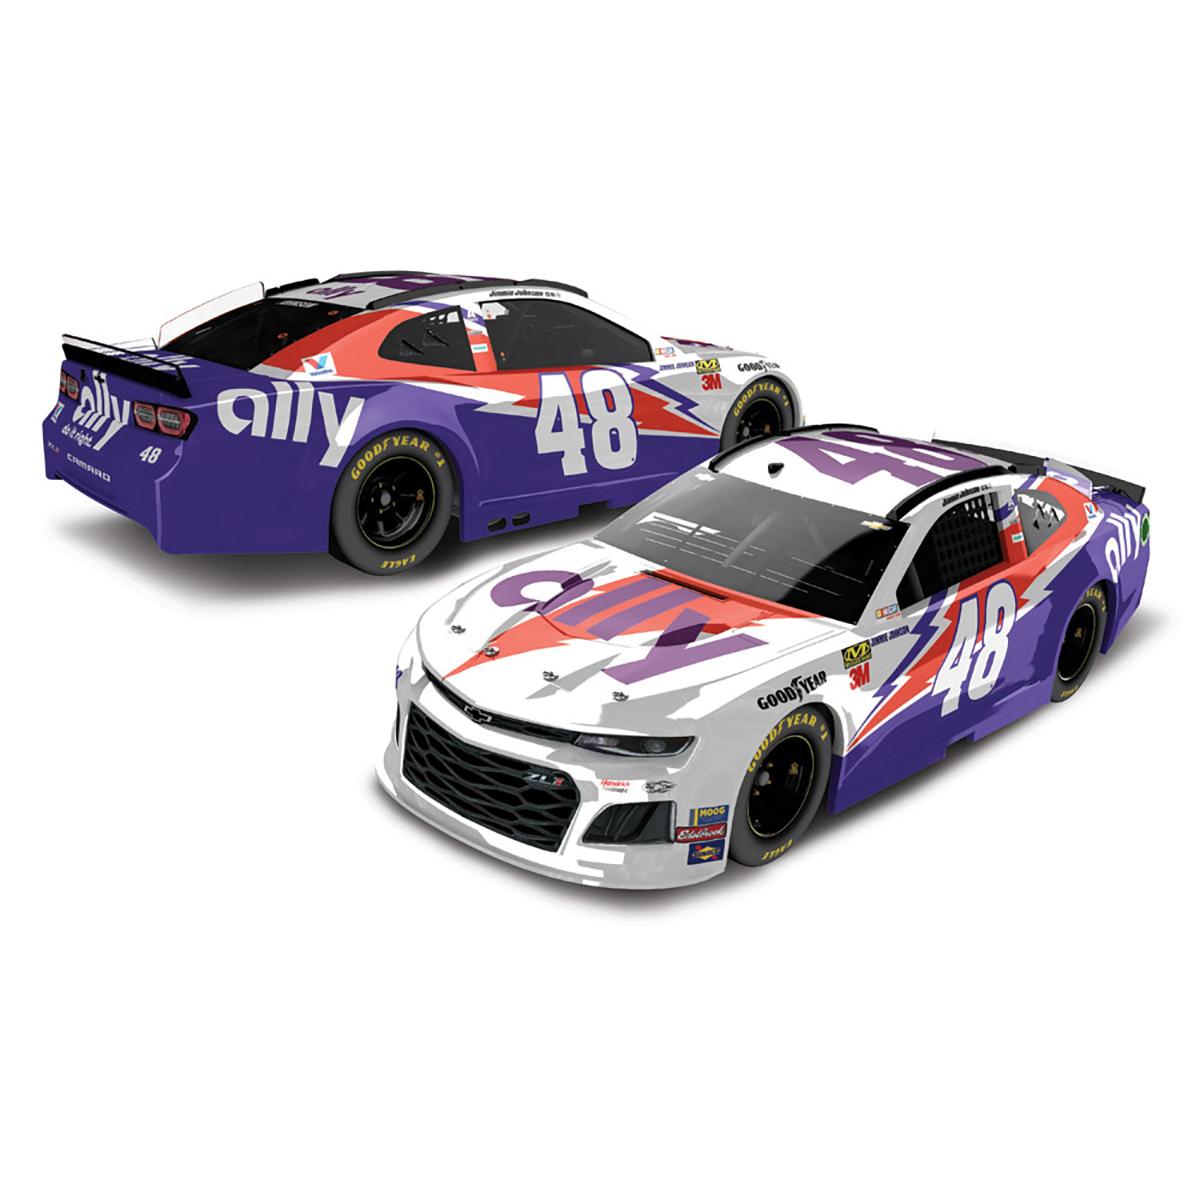 Jimmie Johnson #48 2019 Ally Darlington NASCAR 1:24 ELITE - Die Cast